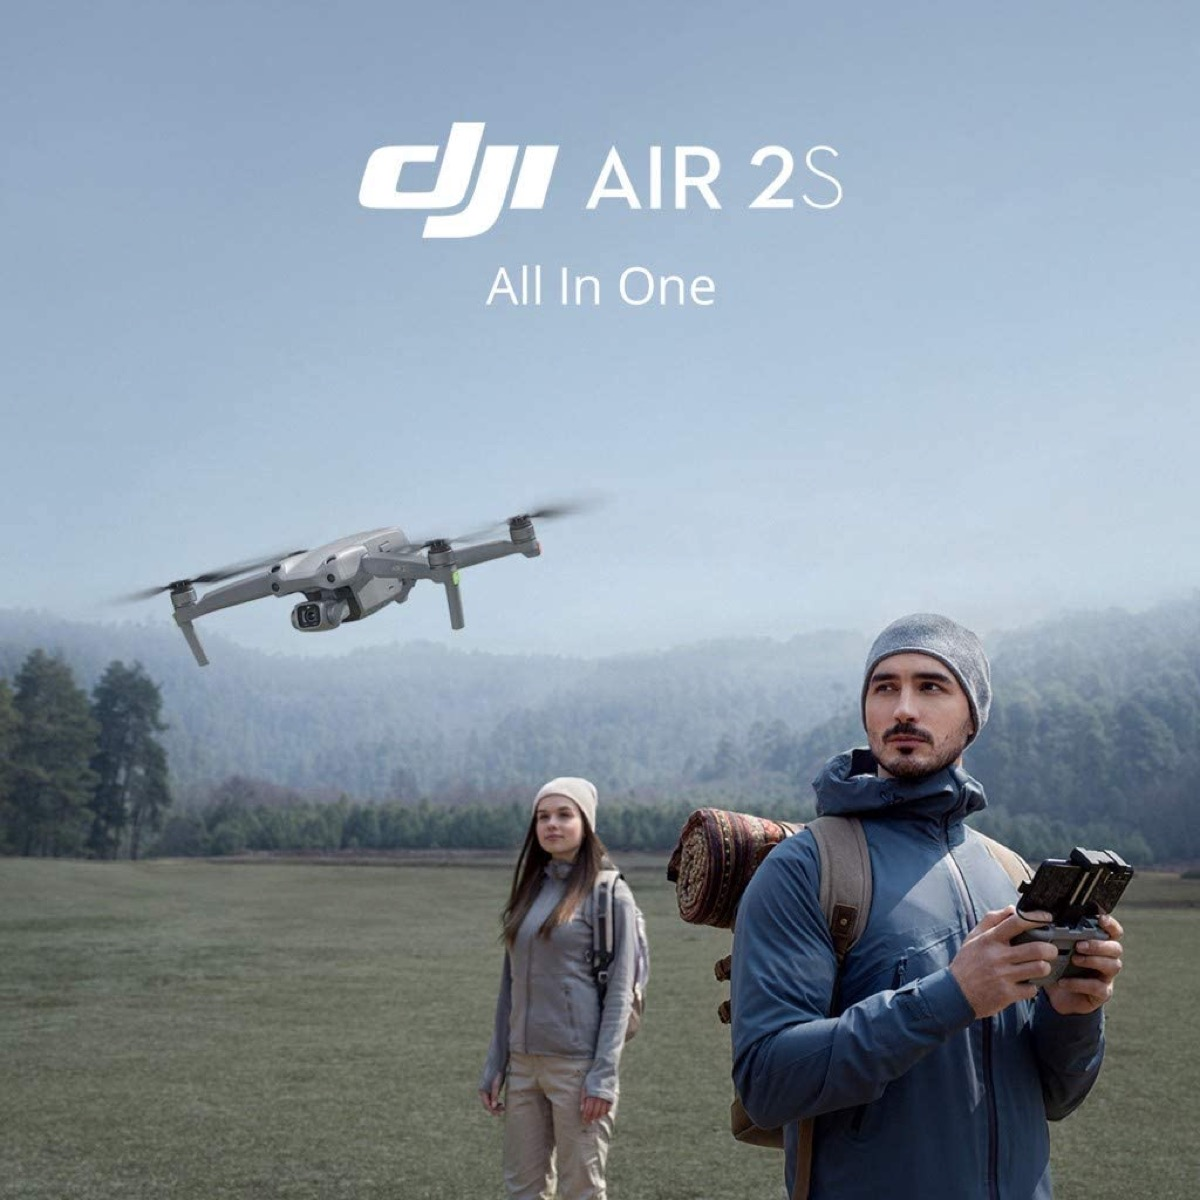 DJI Air 2S,